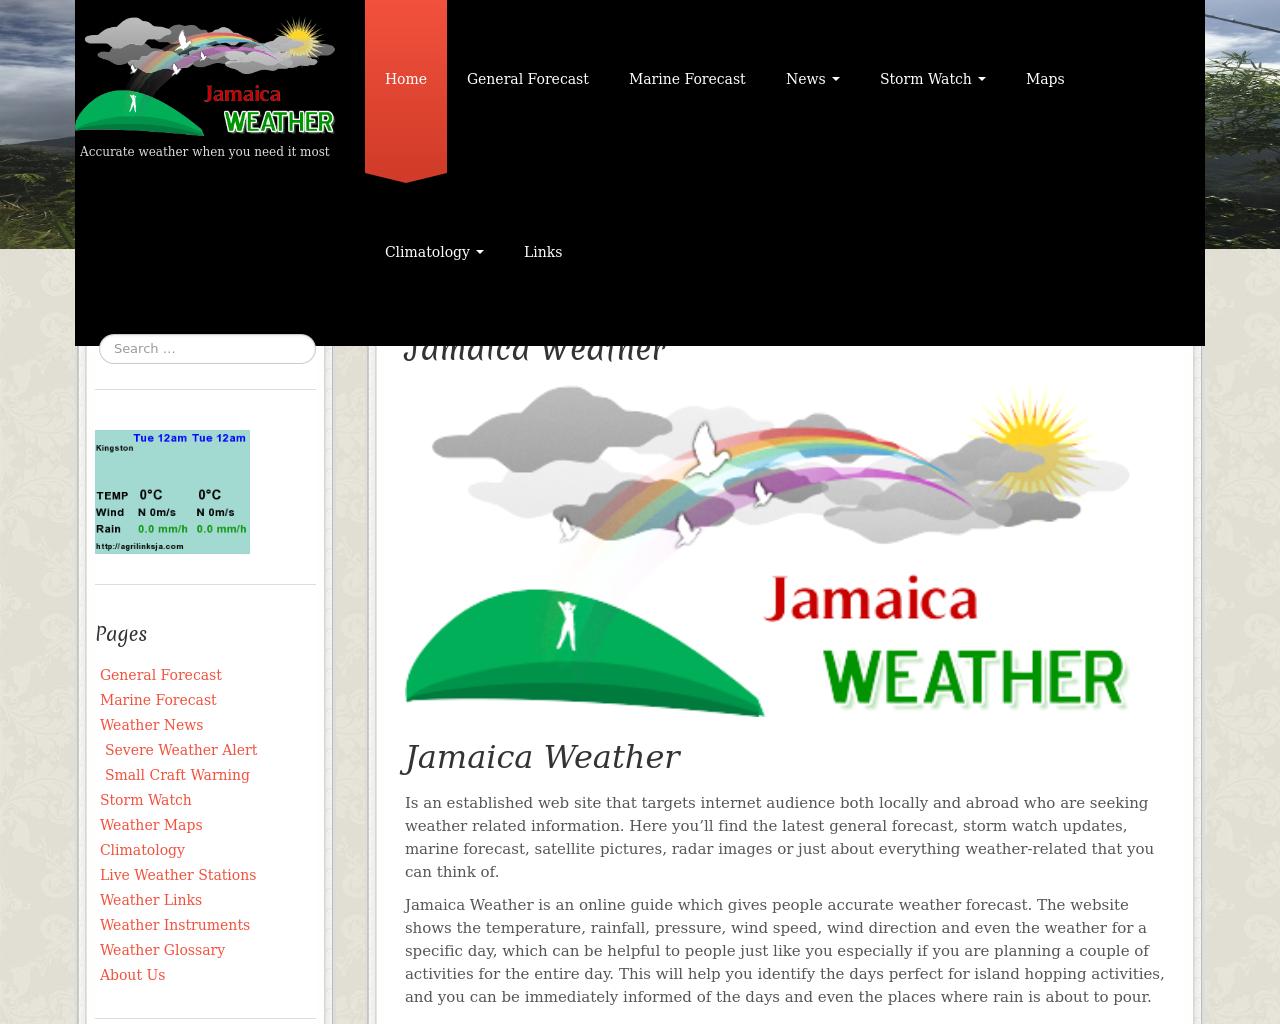 Jamaica-Weather-Advertising-Reviews-Pricing